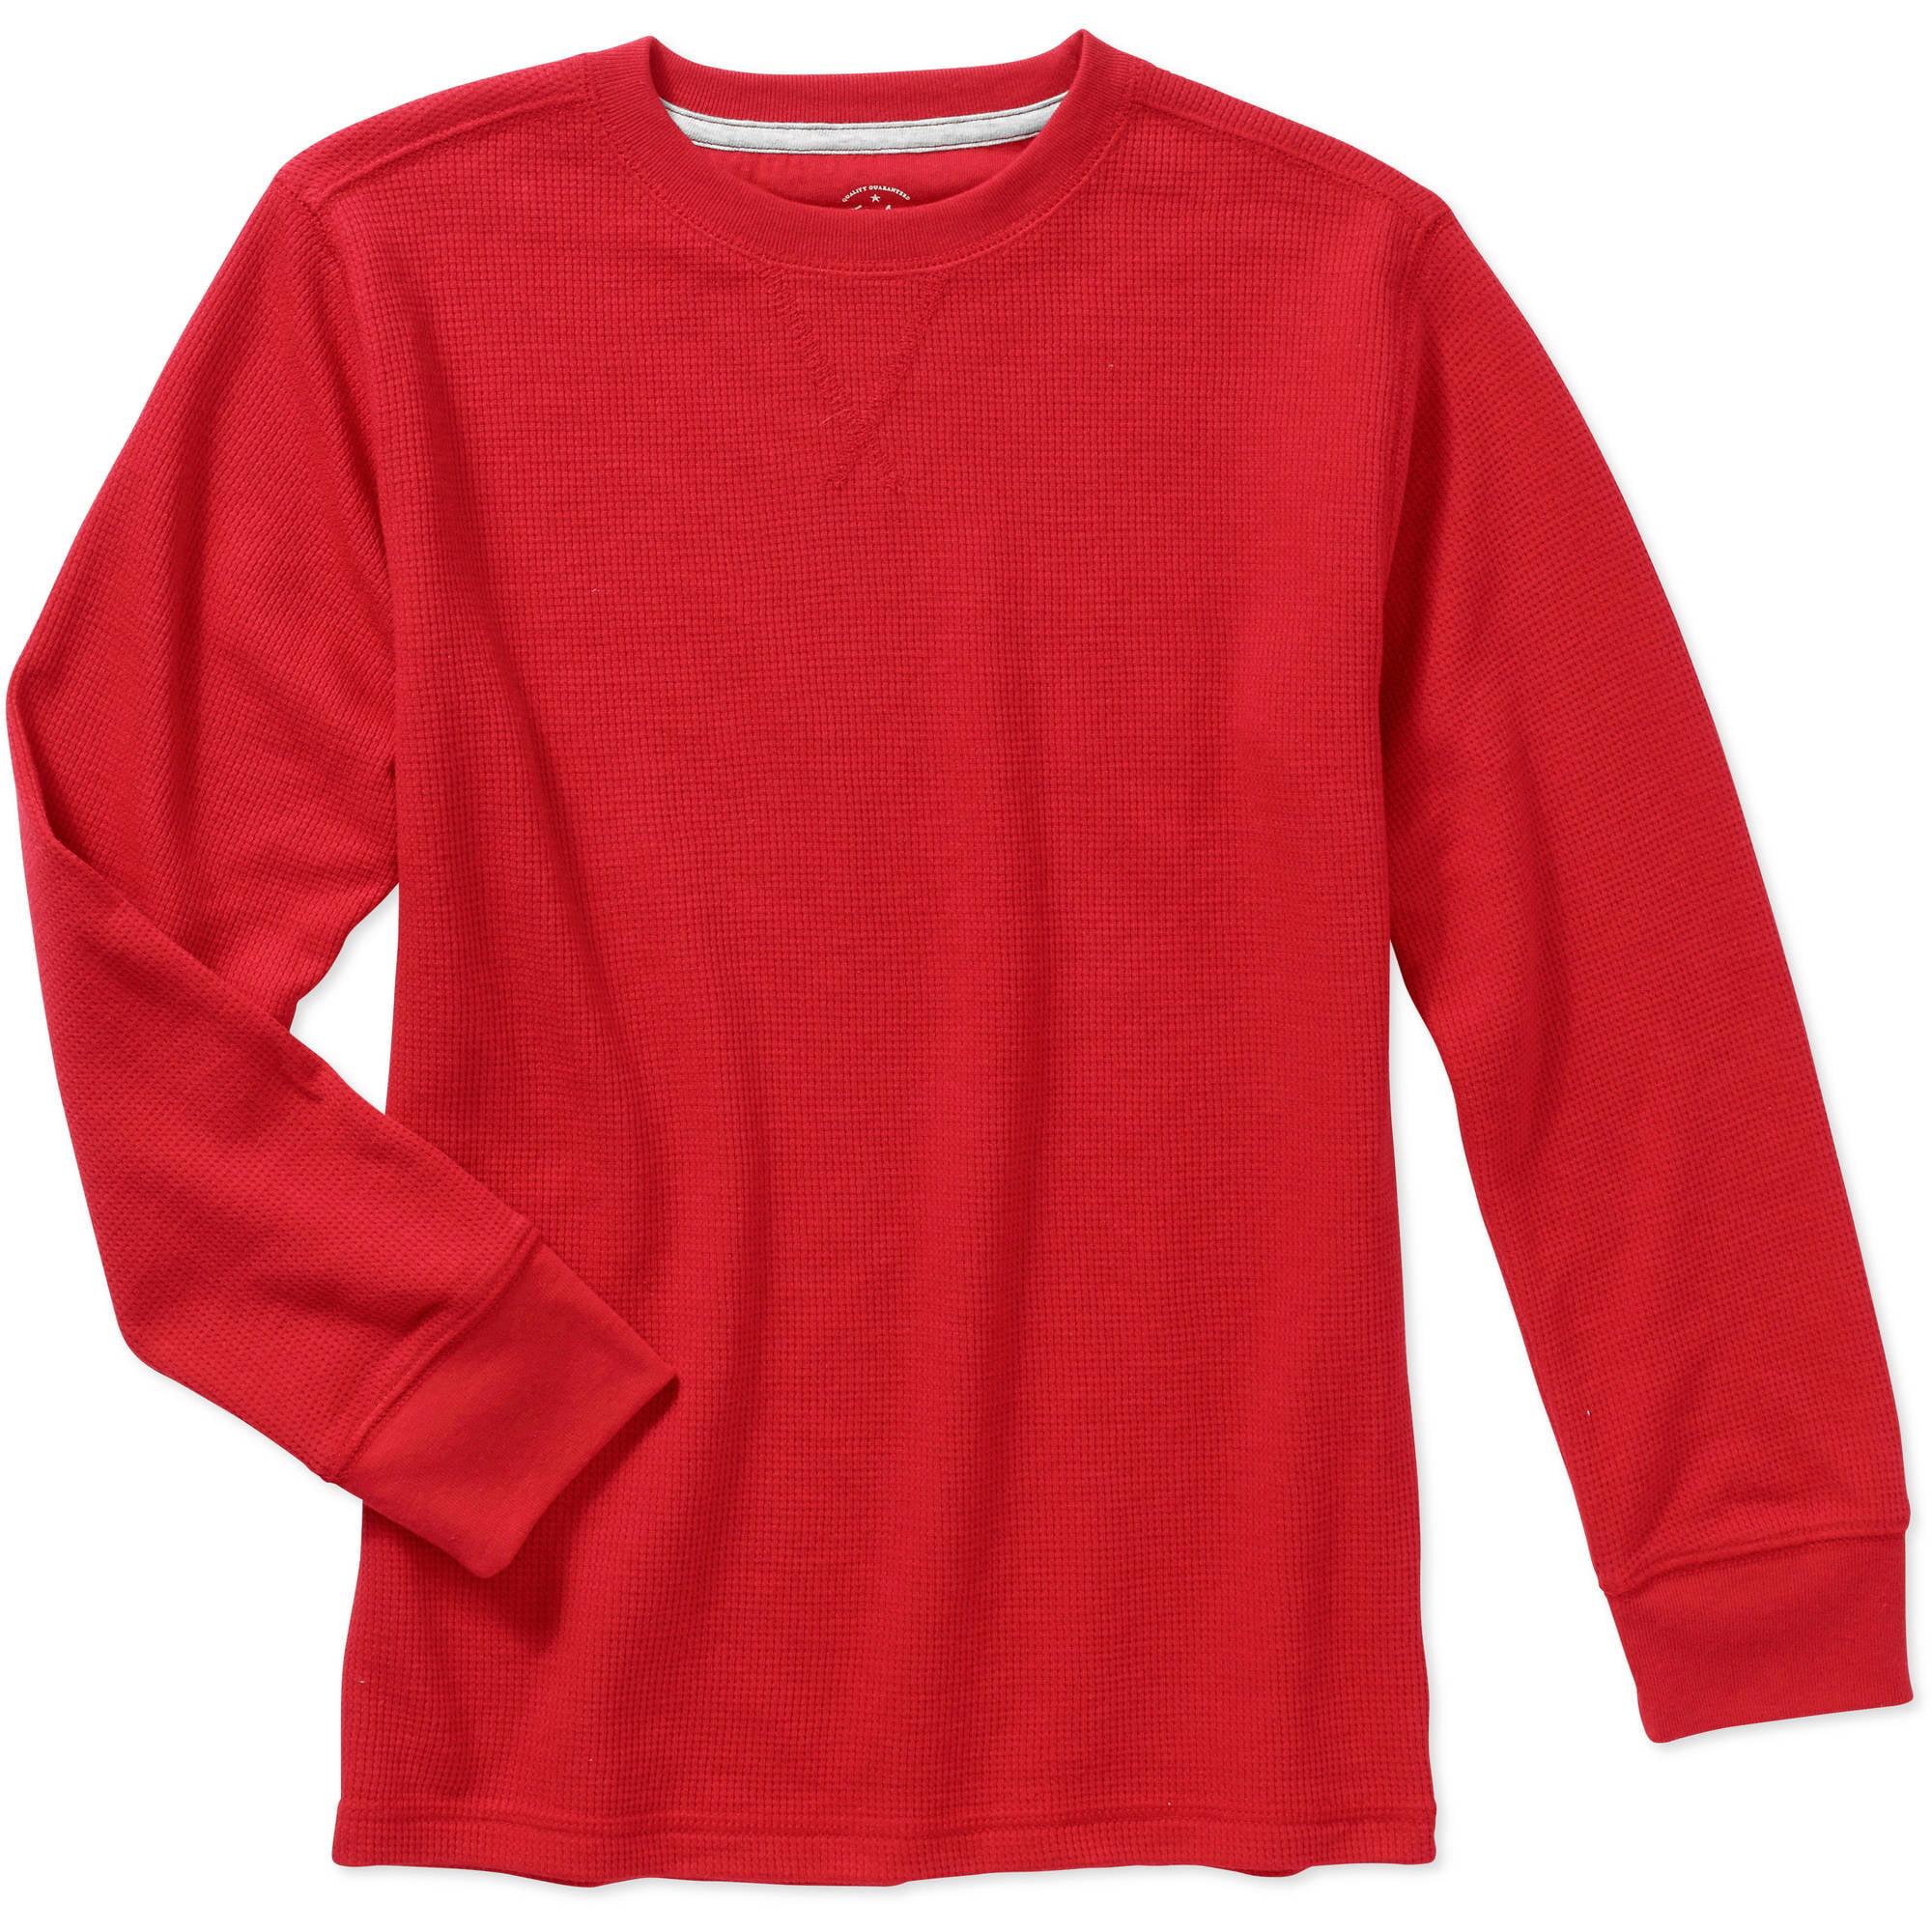 Minecraft - Like a Boss Youth Long Sleeve T-Shirt - Walmart.com